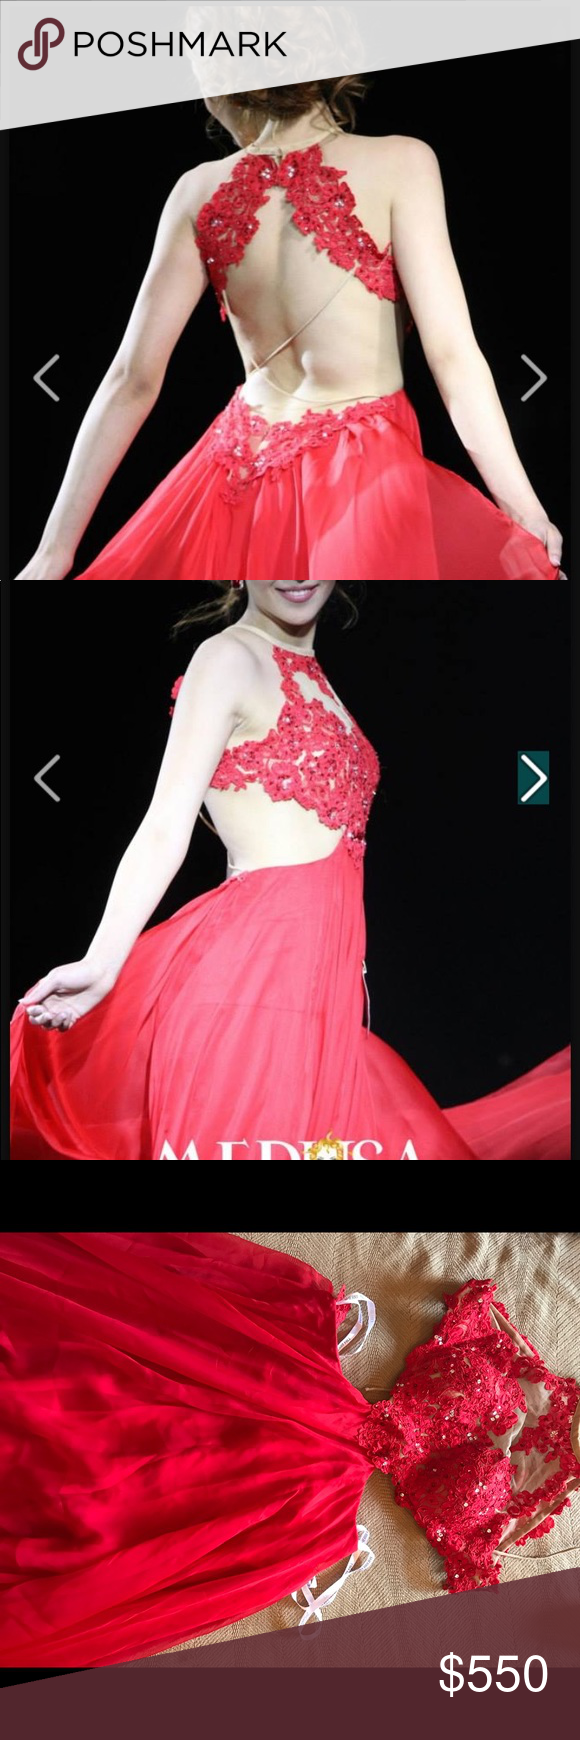 Long red dress | Pinterest